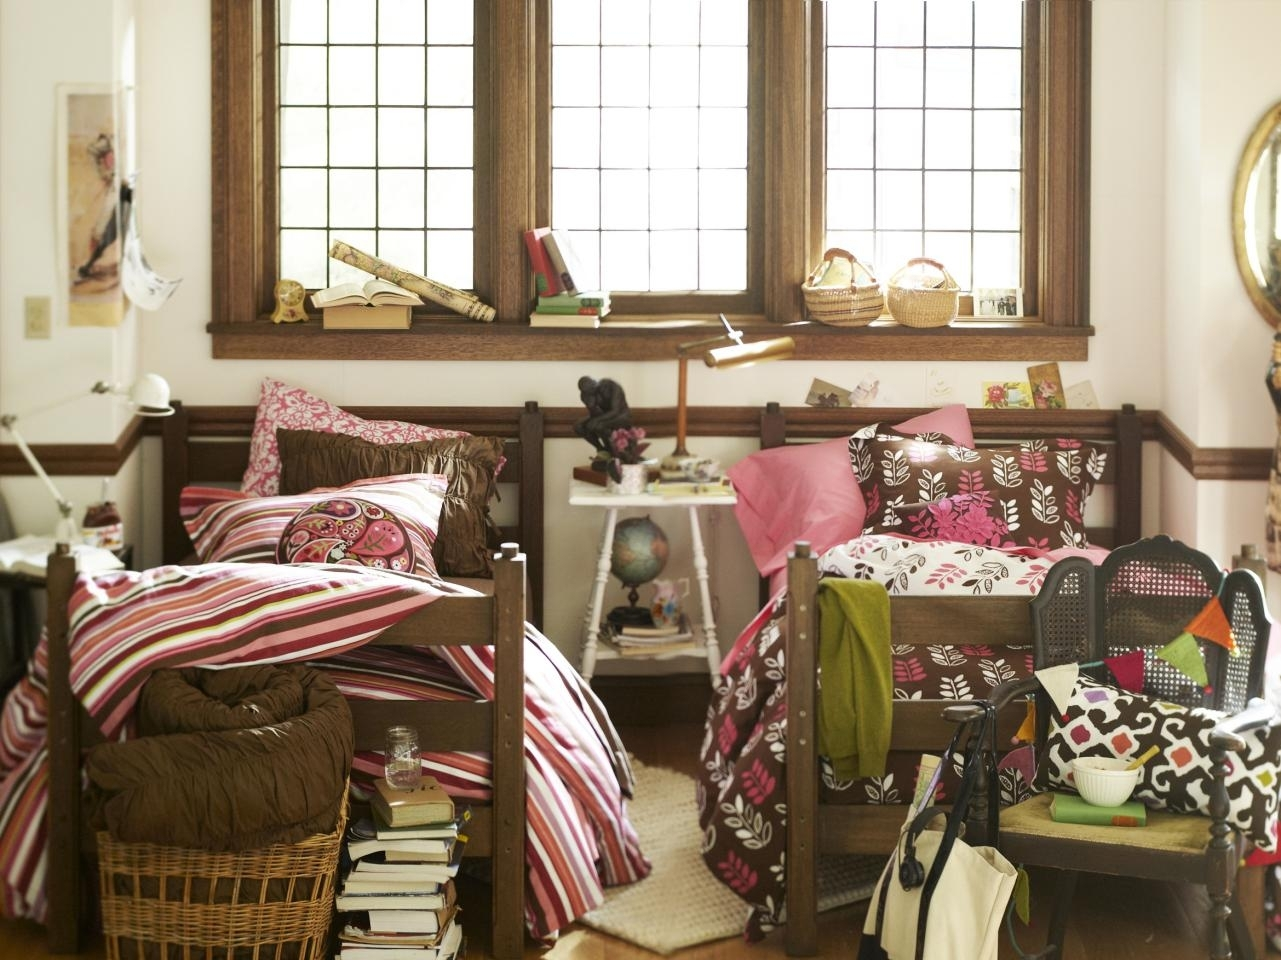 10 Most Popular College Dorm Room Decorating Ideas %name 2021